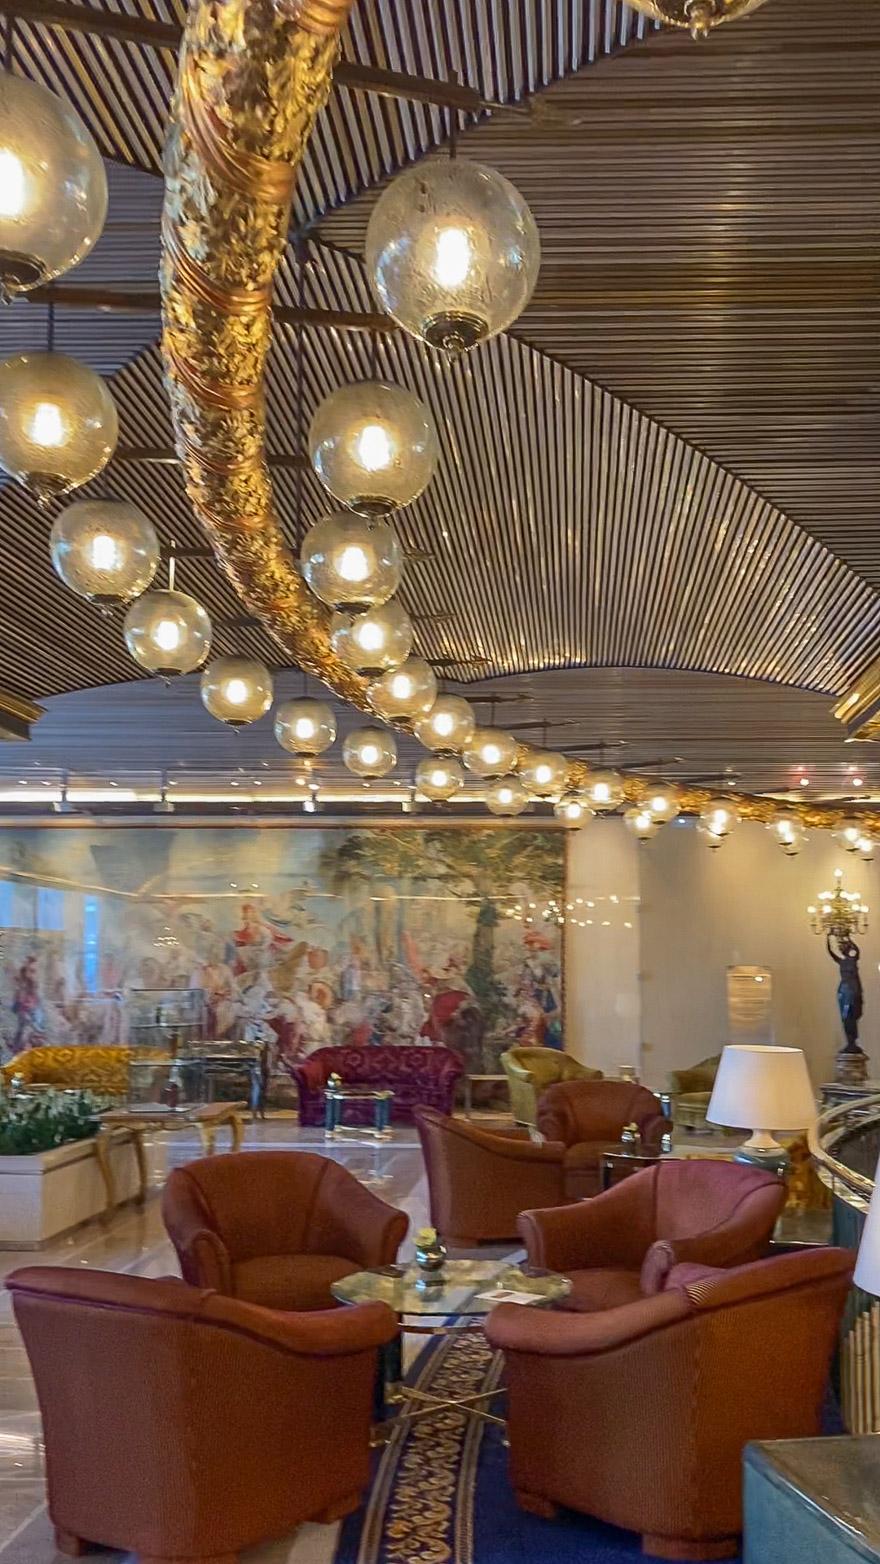 waldorf cavalieri 6 - REVIEW - Rome Cavalieri a Waldorf Astoria Hotel : Premium Rome View Room [COVID-era]